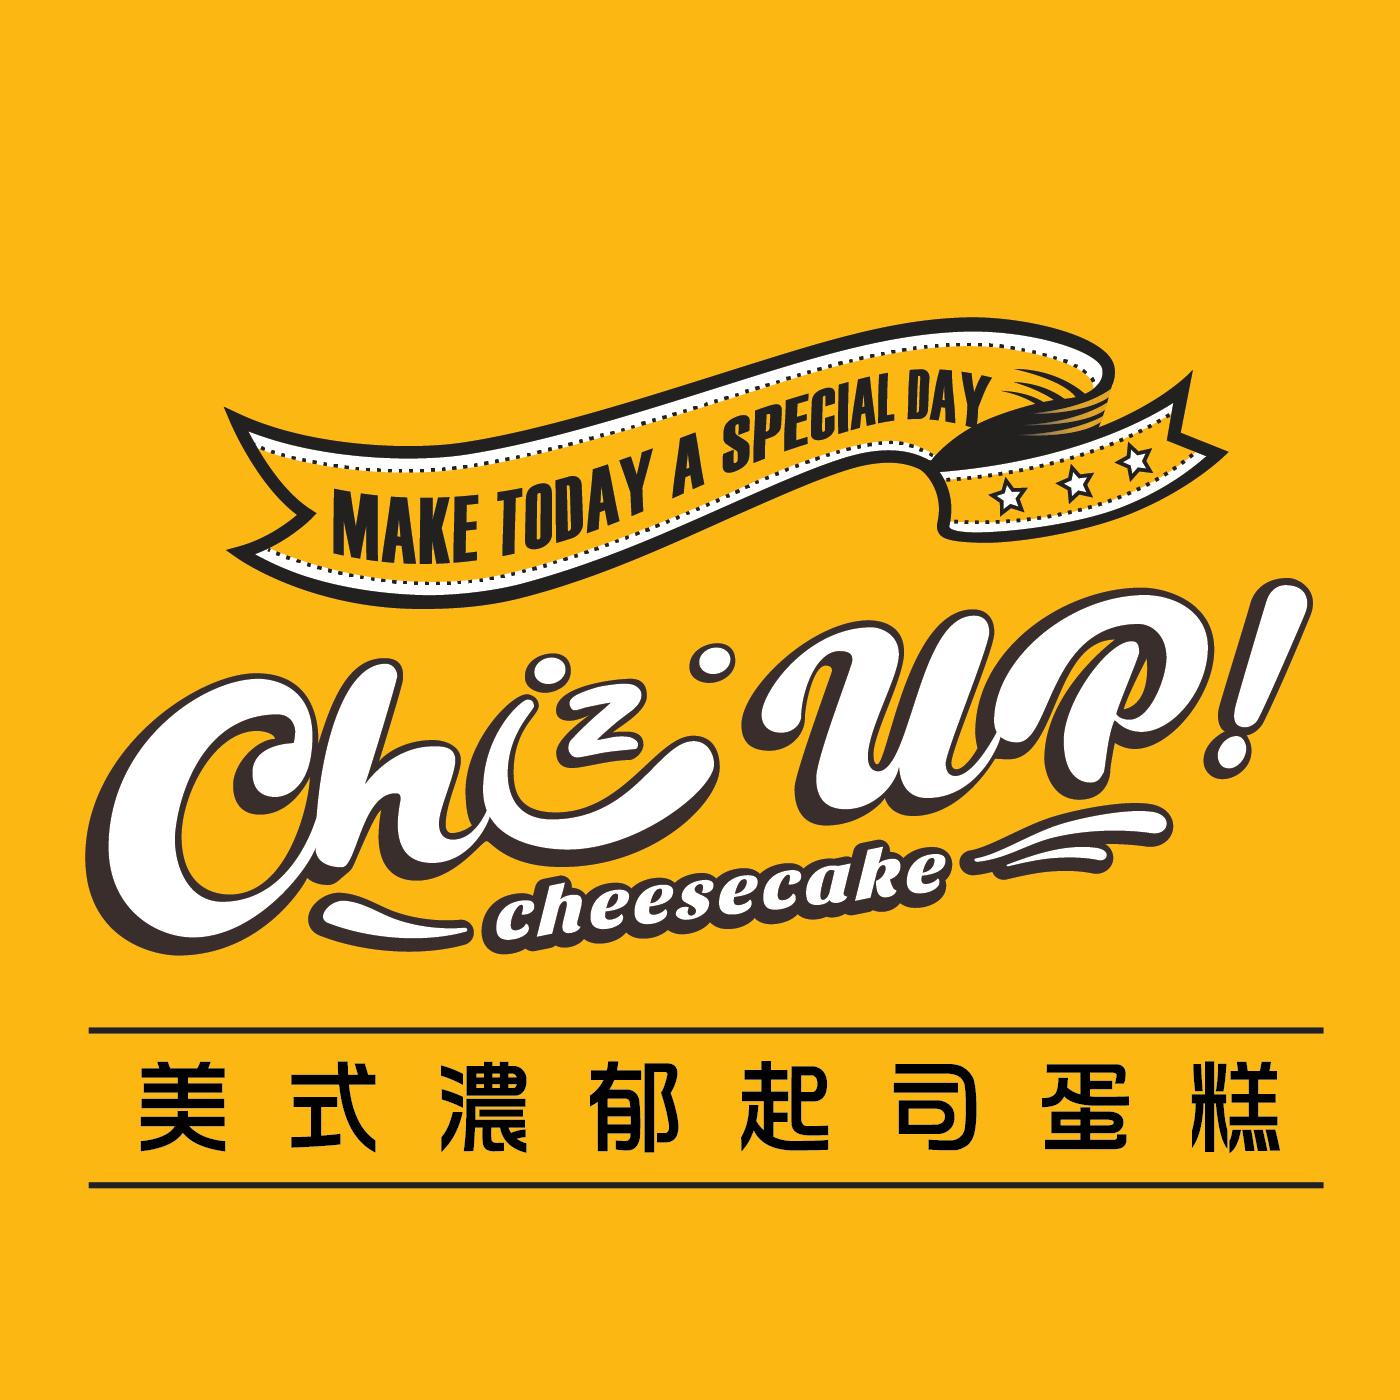 ChizUP美式濃郁起司蛋糕 - 樂天市場